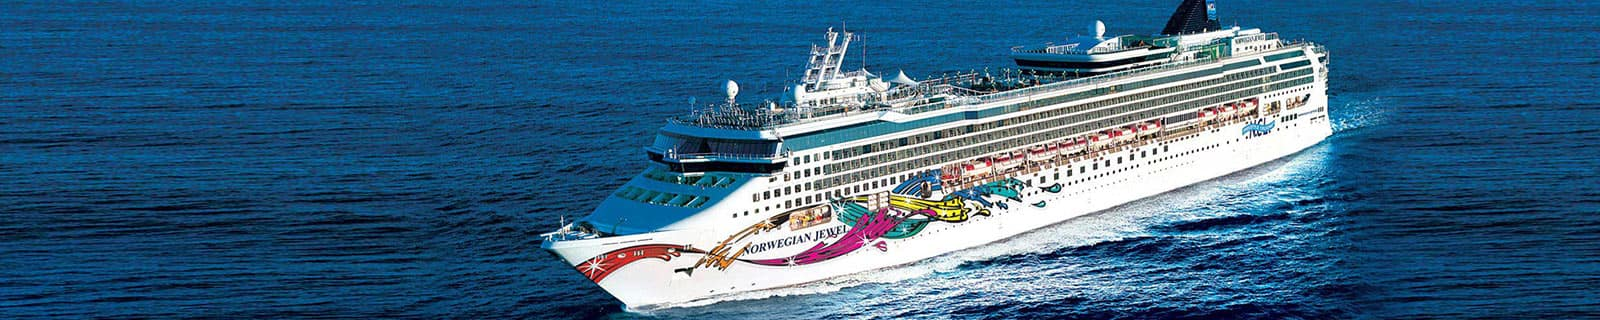 Norwegian Jewel Cruise Ship Norwegian Jewel Deck Plans Norwegian Cruise Line